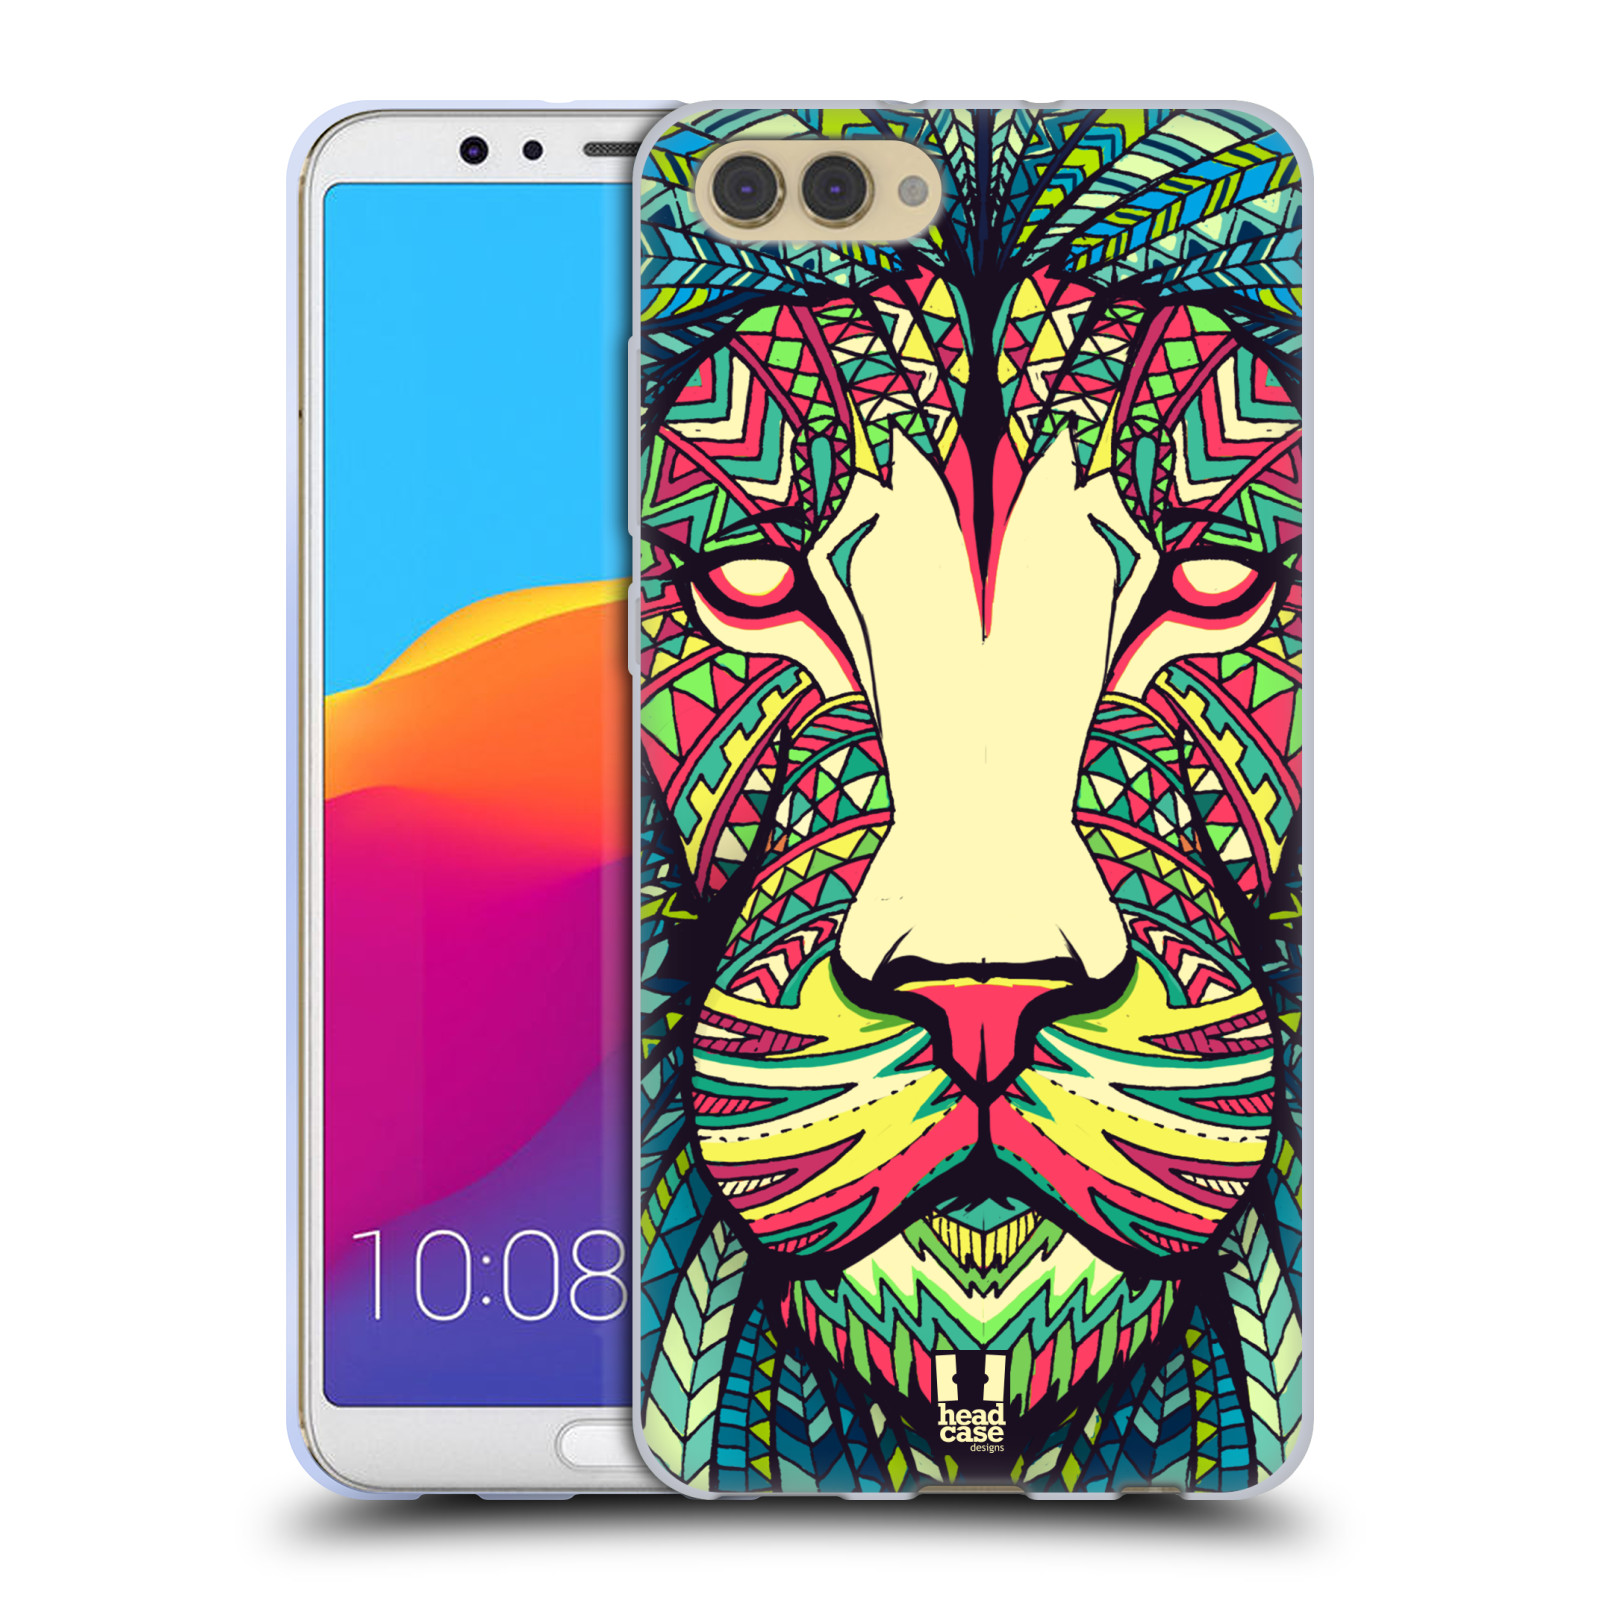 Silikonové pouzdro na mobil Honor View 10 - Head Case - AZTEC LEV